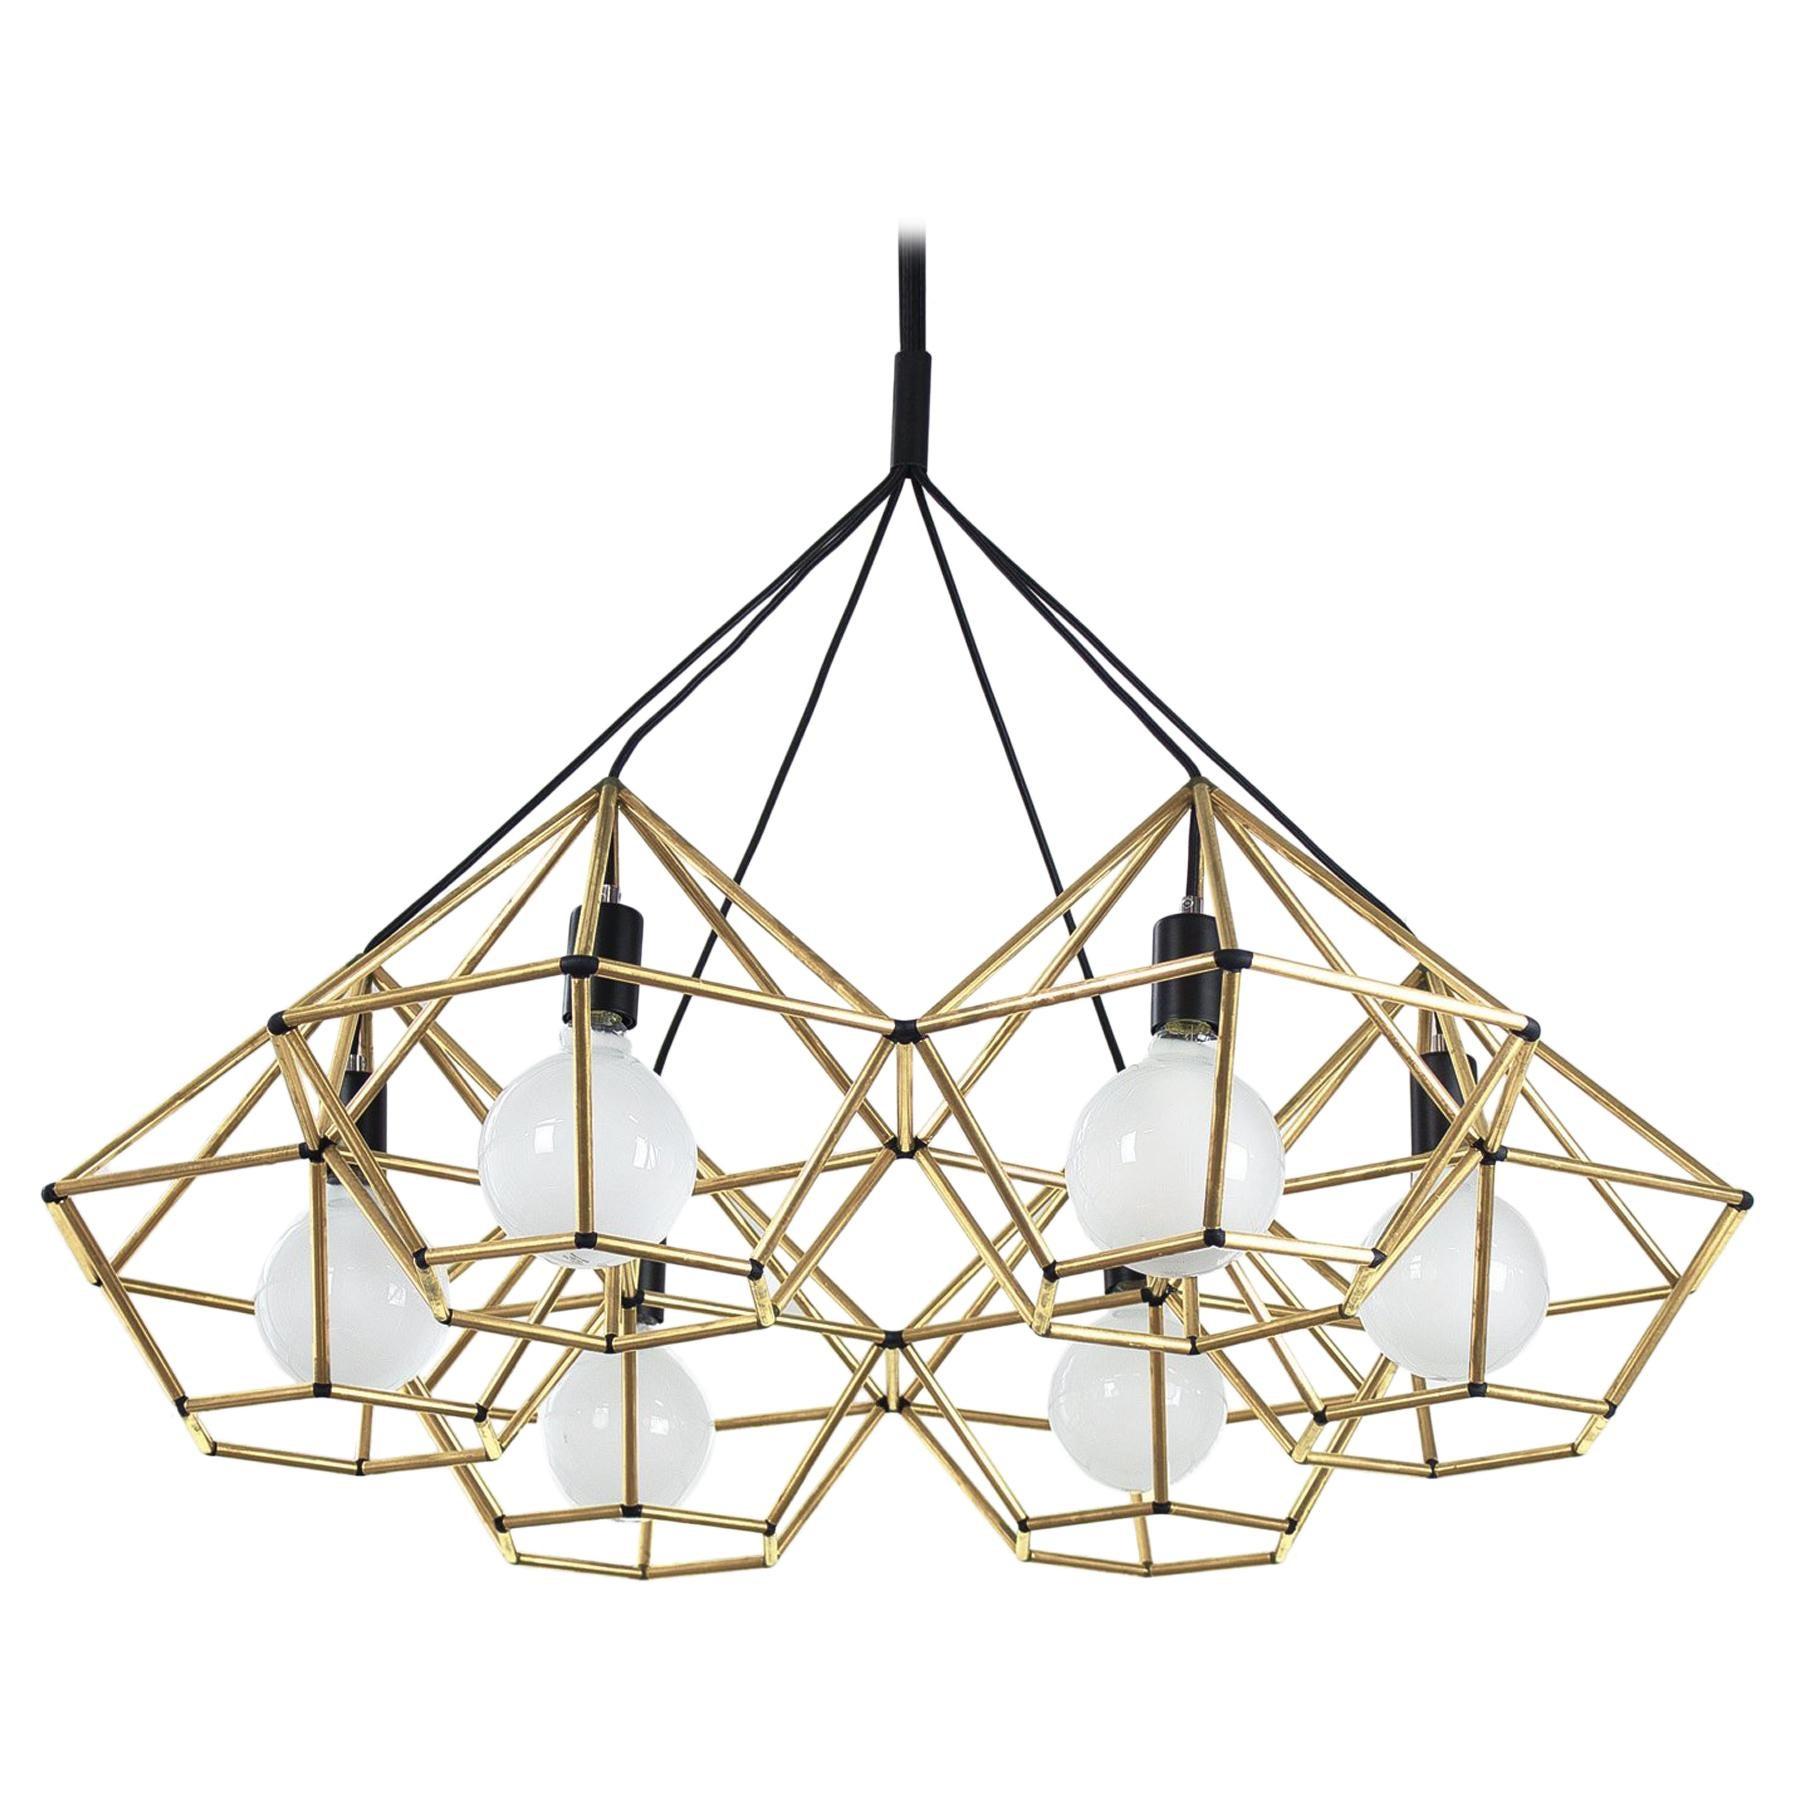 Rough Diamond Chandelier, Modern, Brass Tube, Geometric, Pendant Light